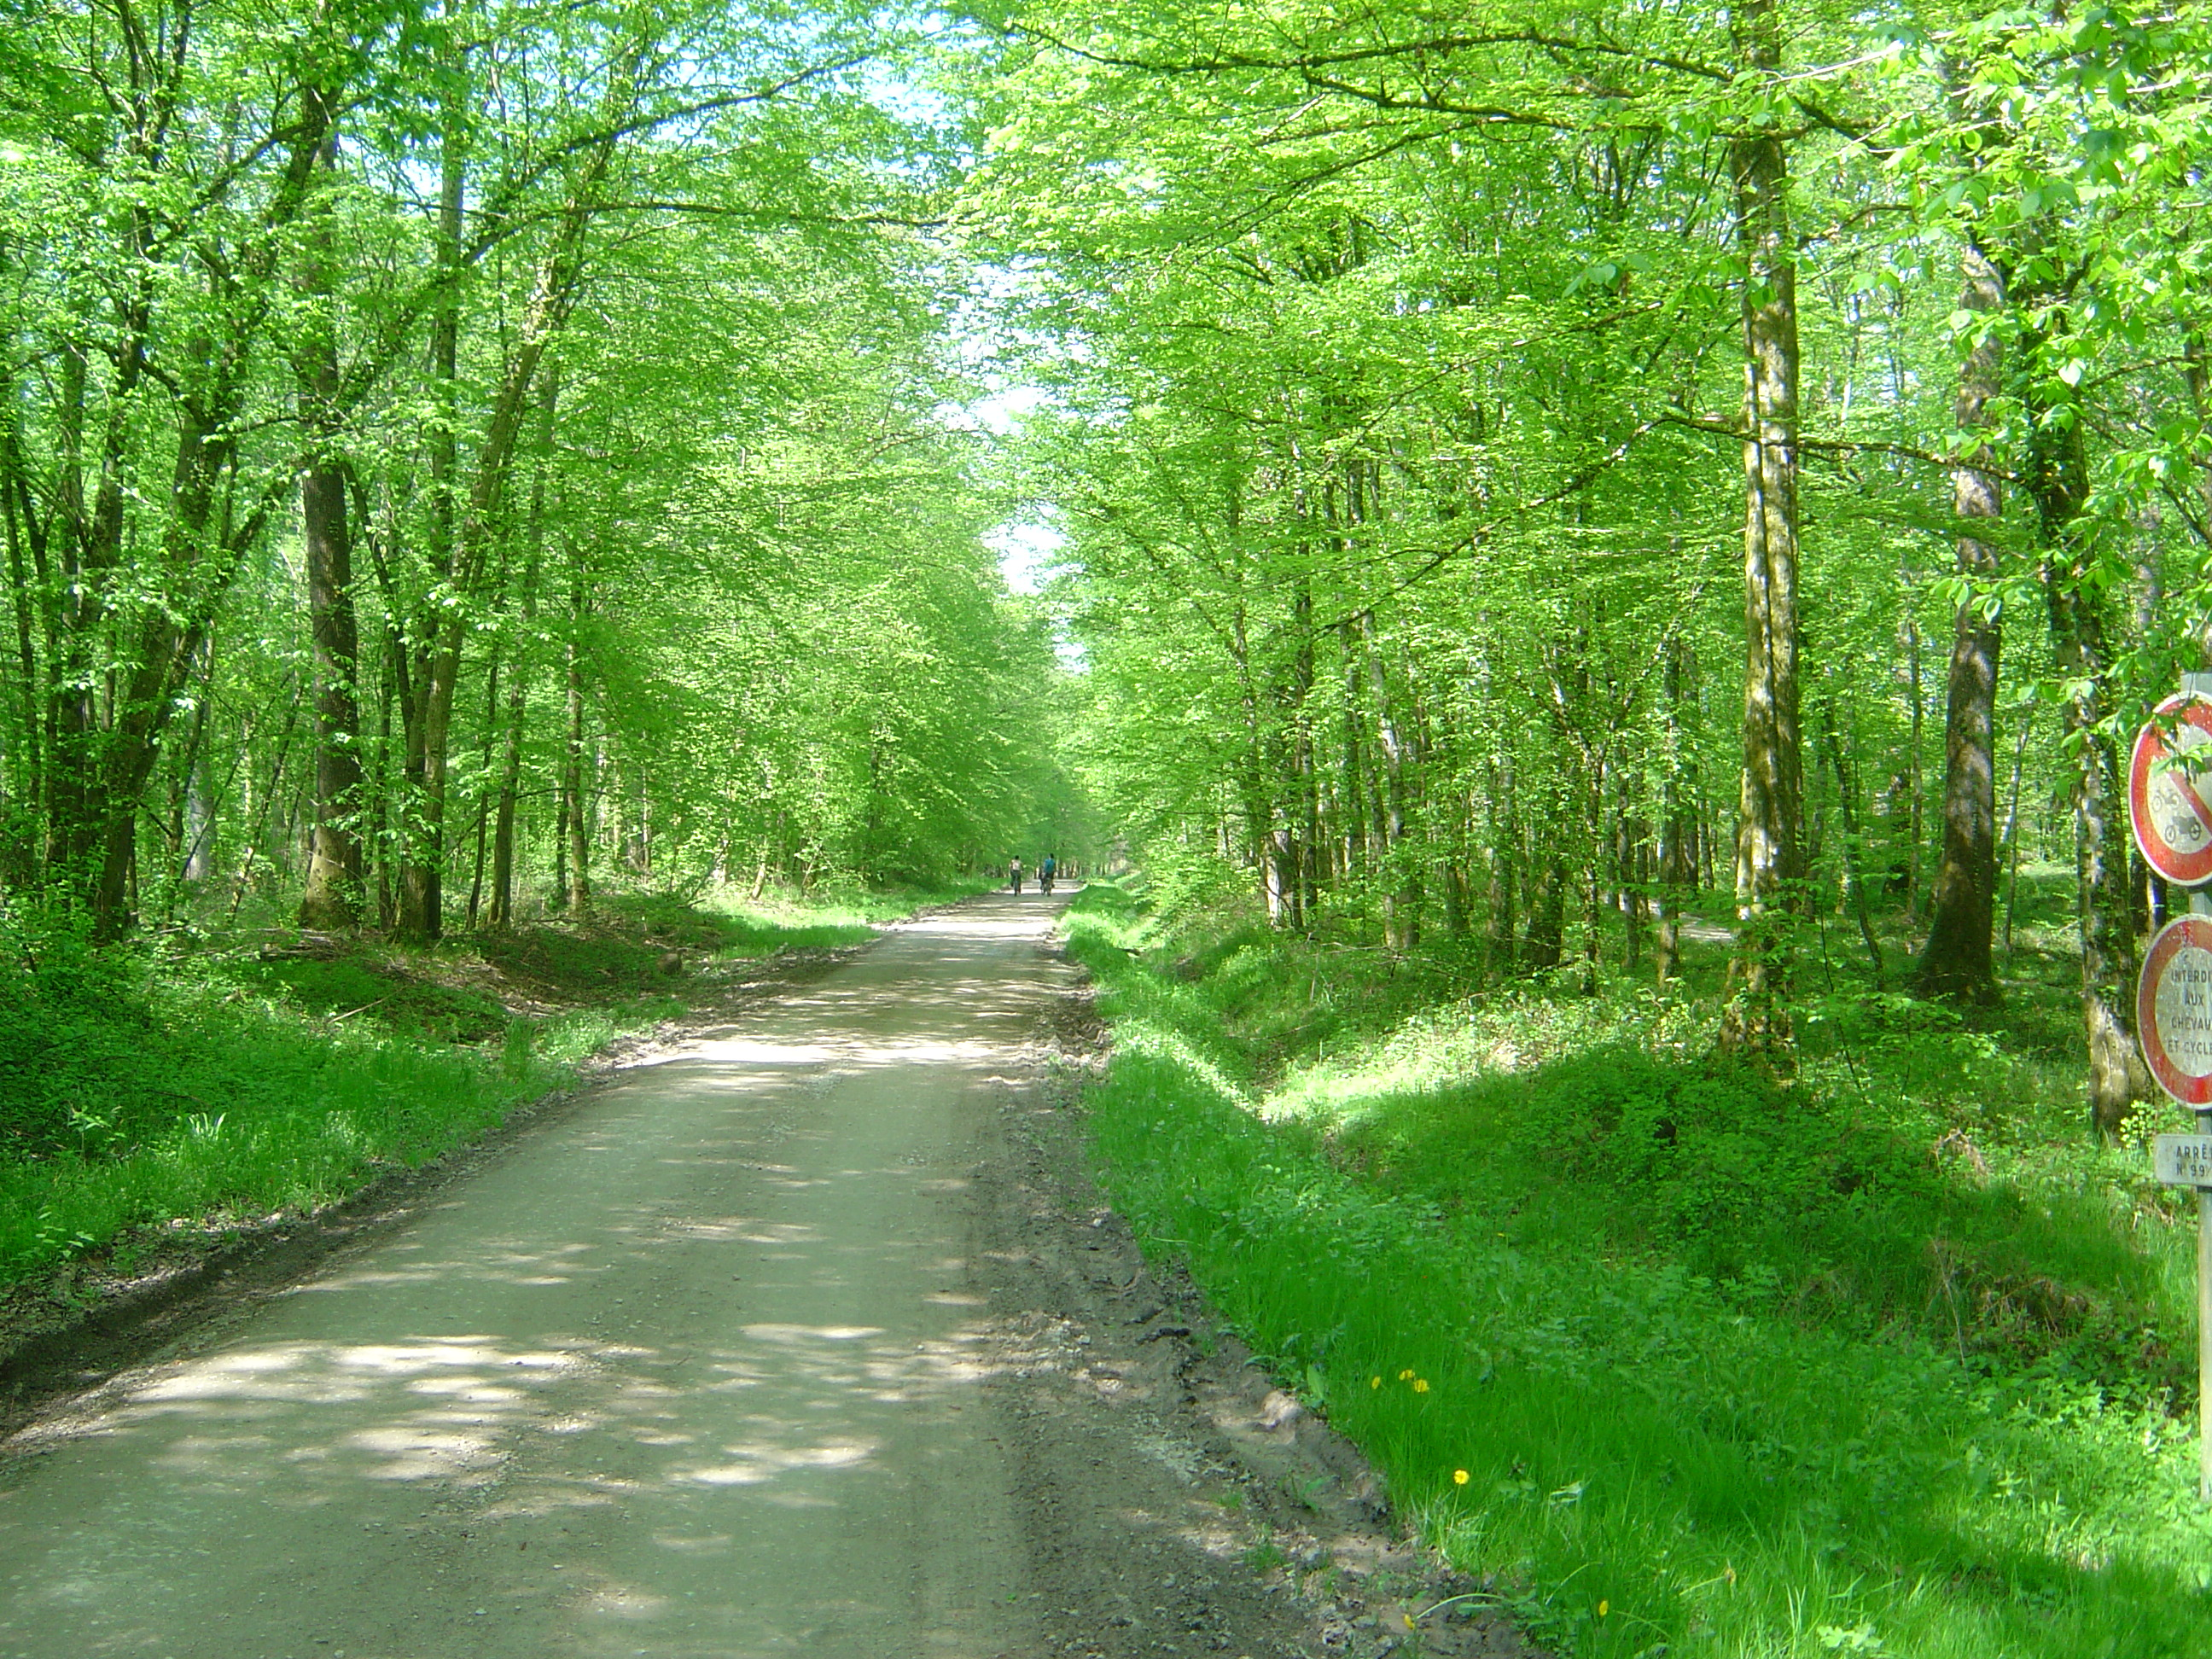 File:Chemin forêt Vy lès Lure.JPG - Wikimedia Commons